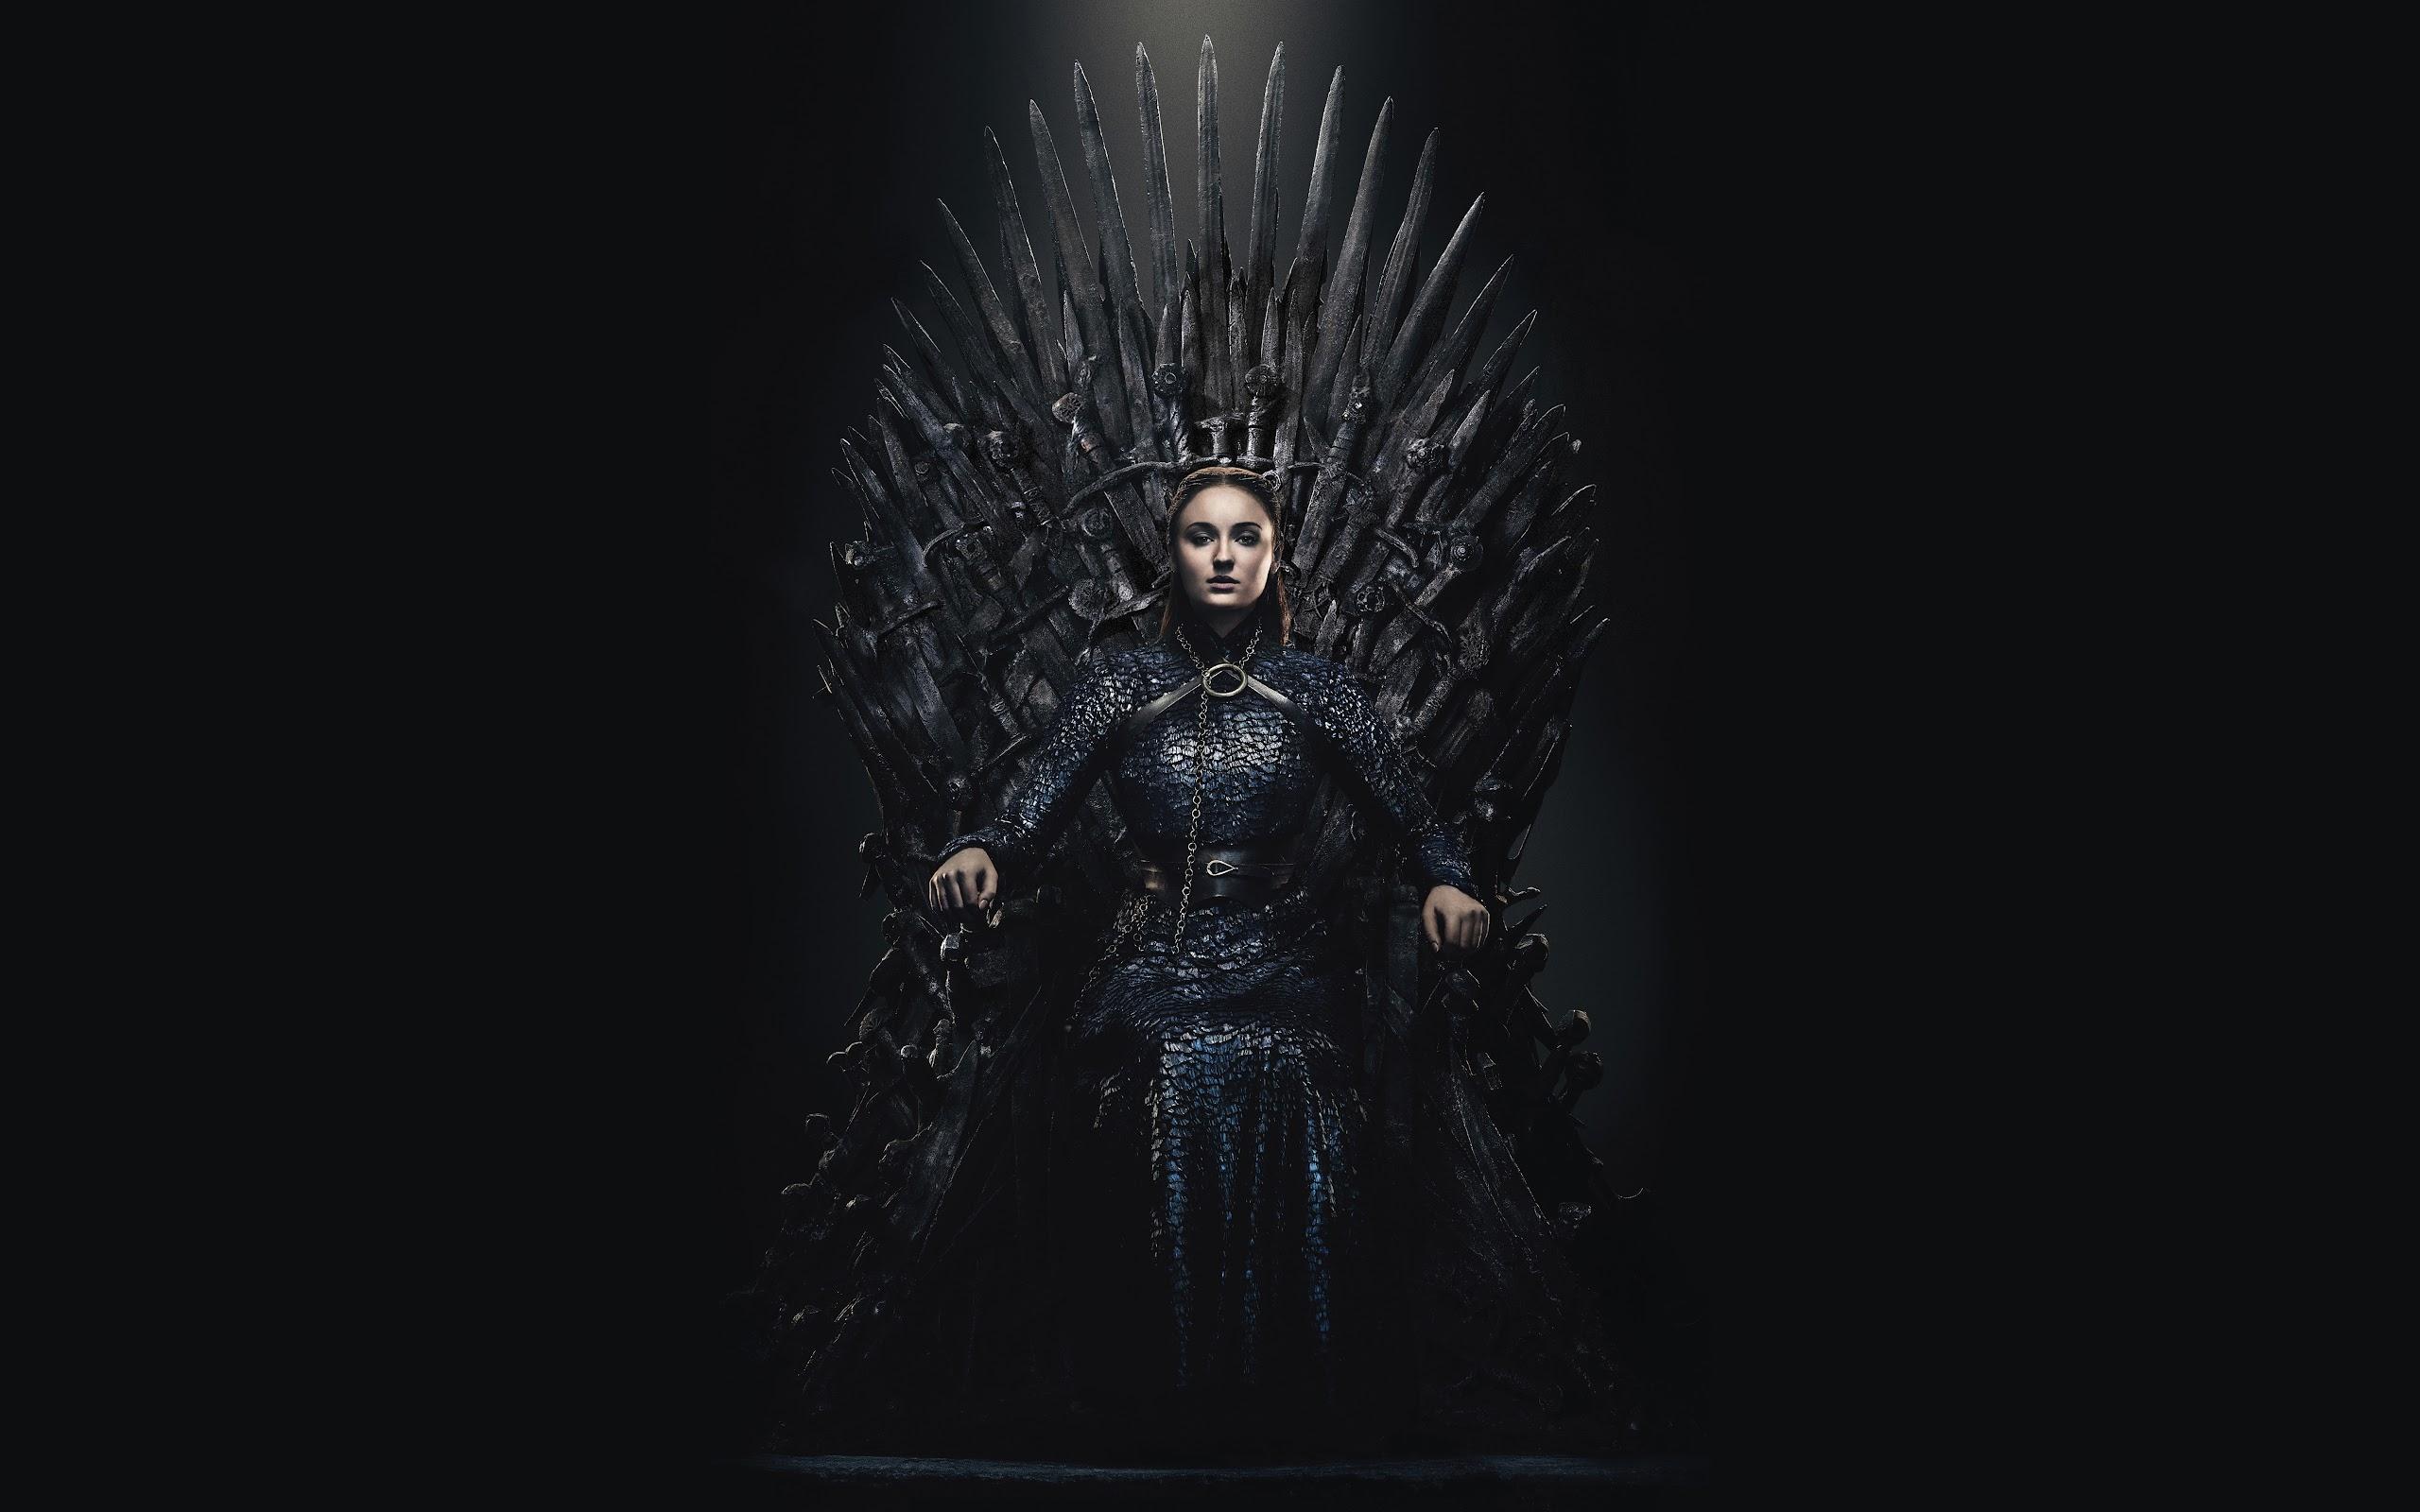 Sansa Stark Game Of Thrones Iron Throne Season 8 8k Wallpaper 86